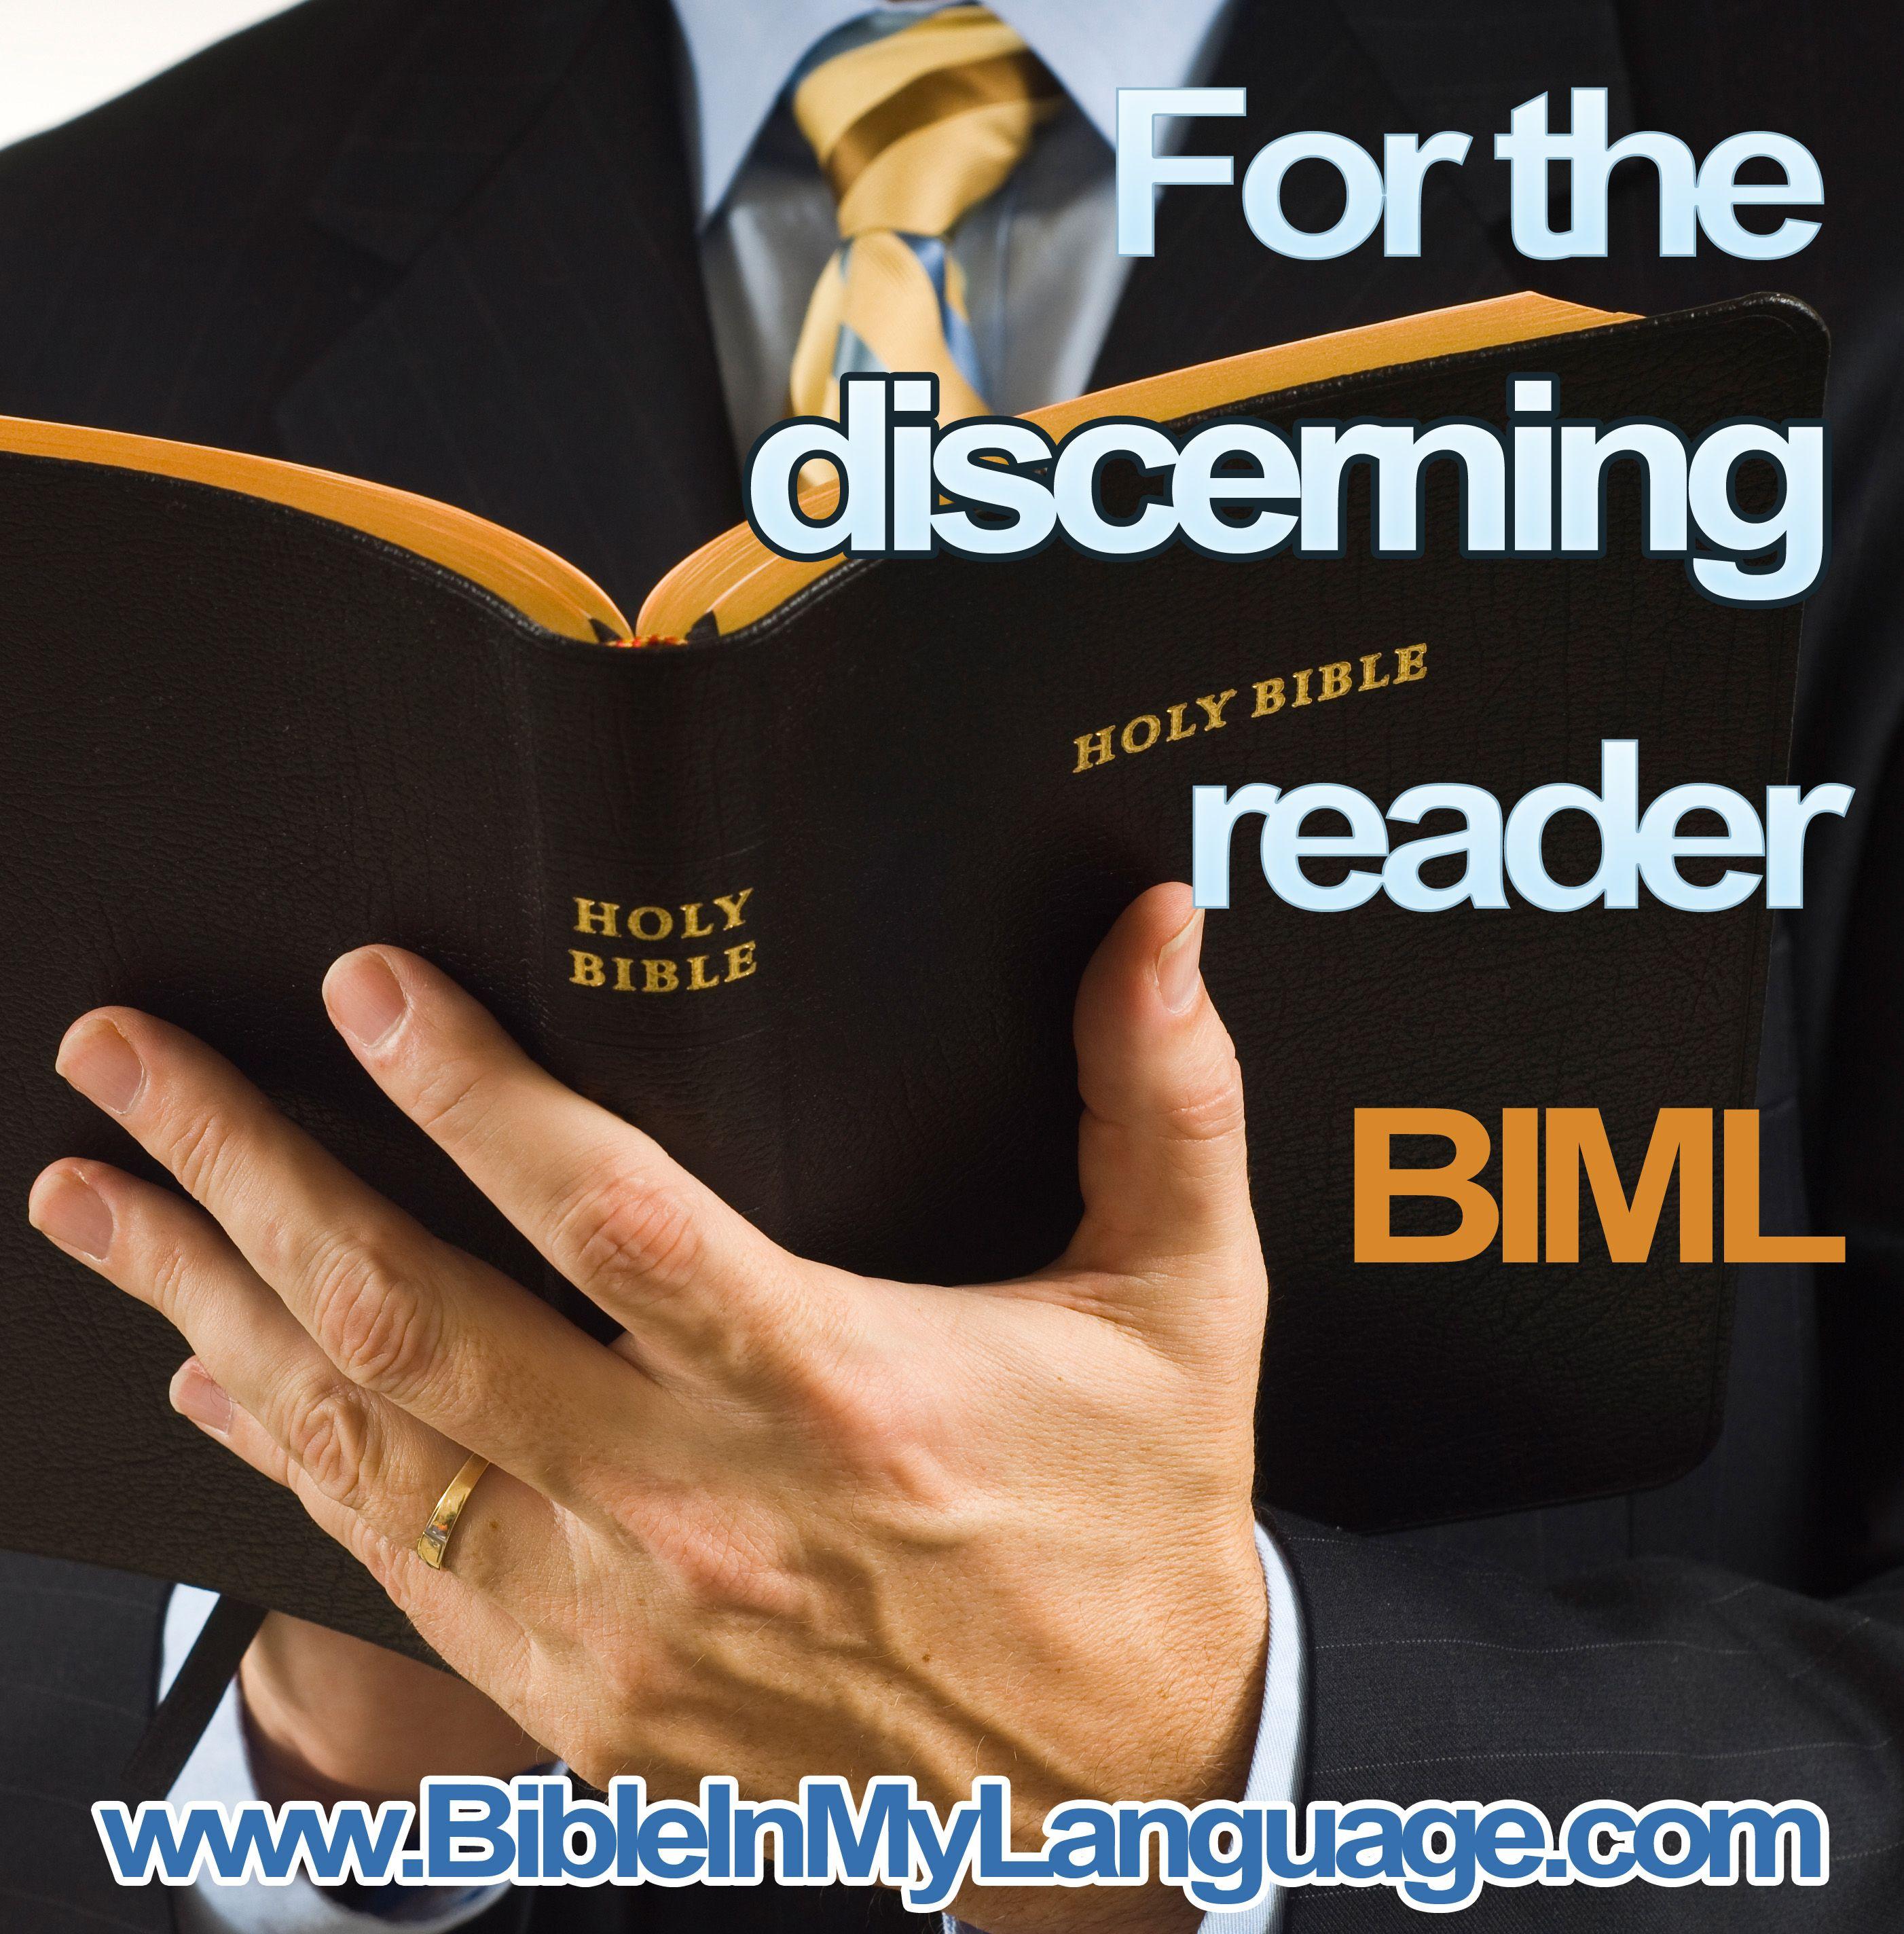 HOLY BIBLE For the discerning reader.  BIML www.bibleinmylangauge.com